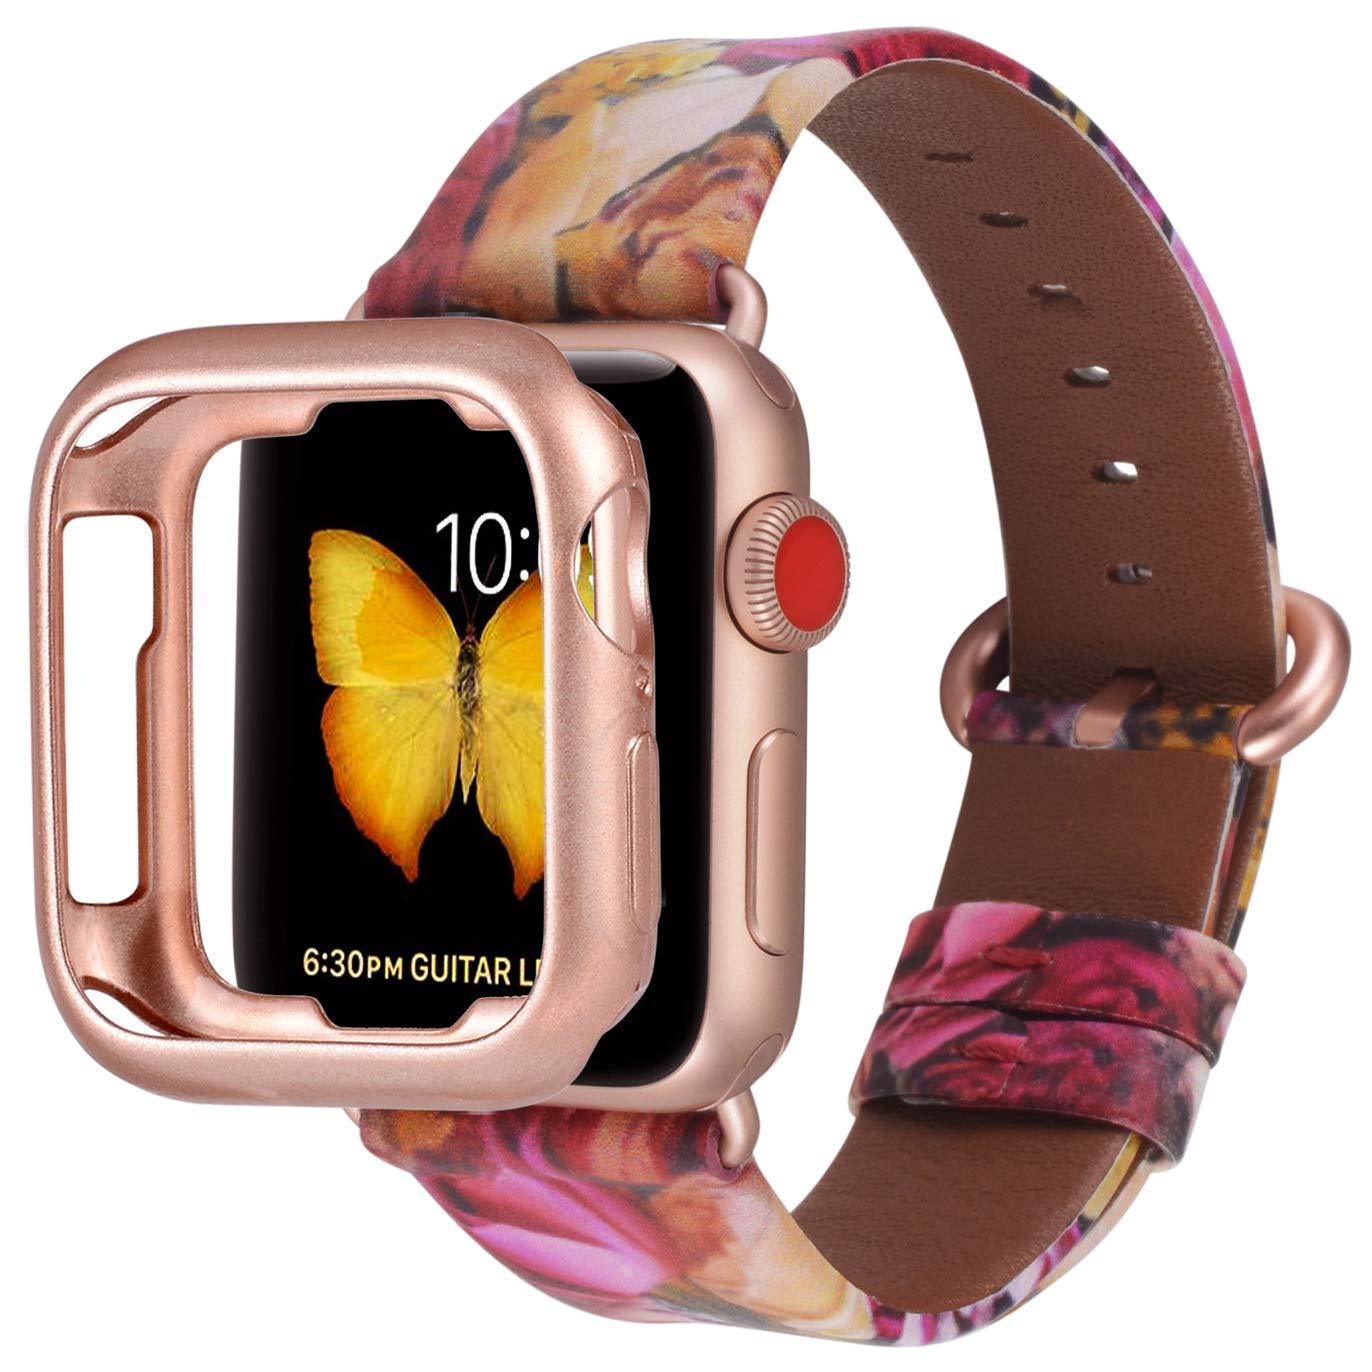 Malla Cuero para Apple Watch (38/40mm) JSGJMY [7THHXP4T]